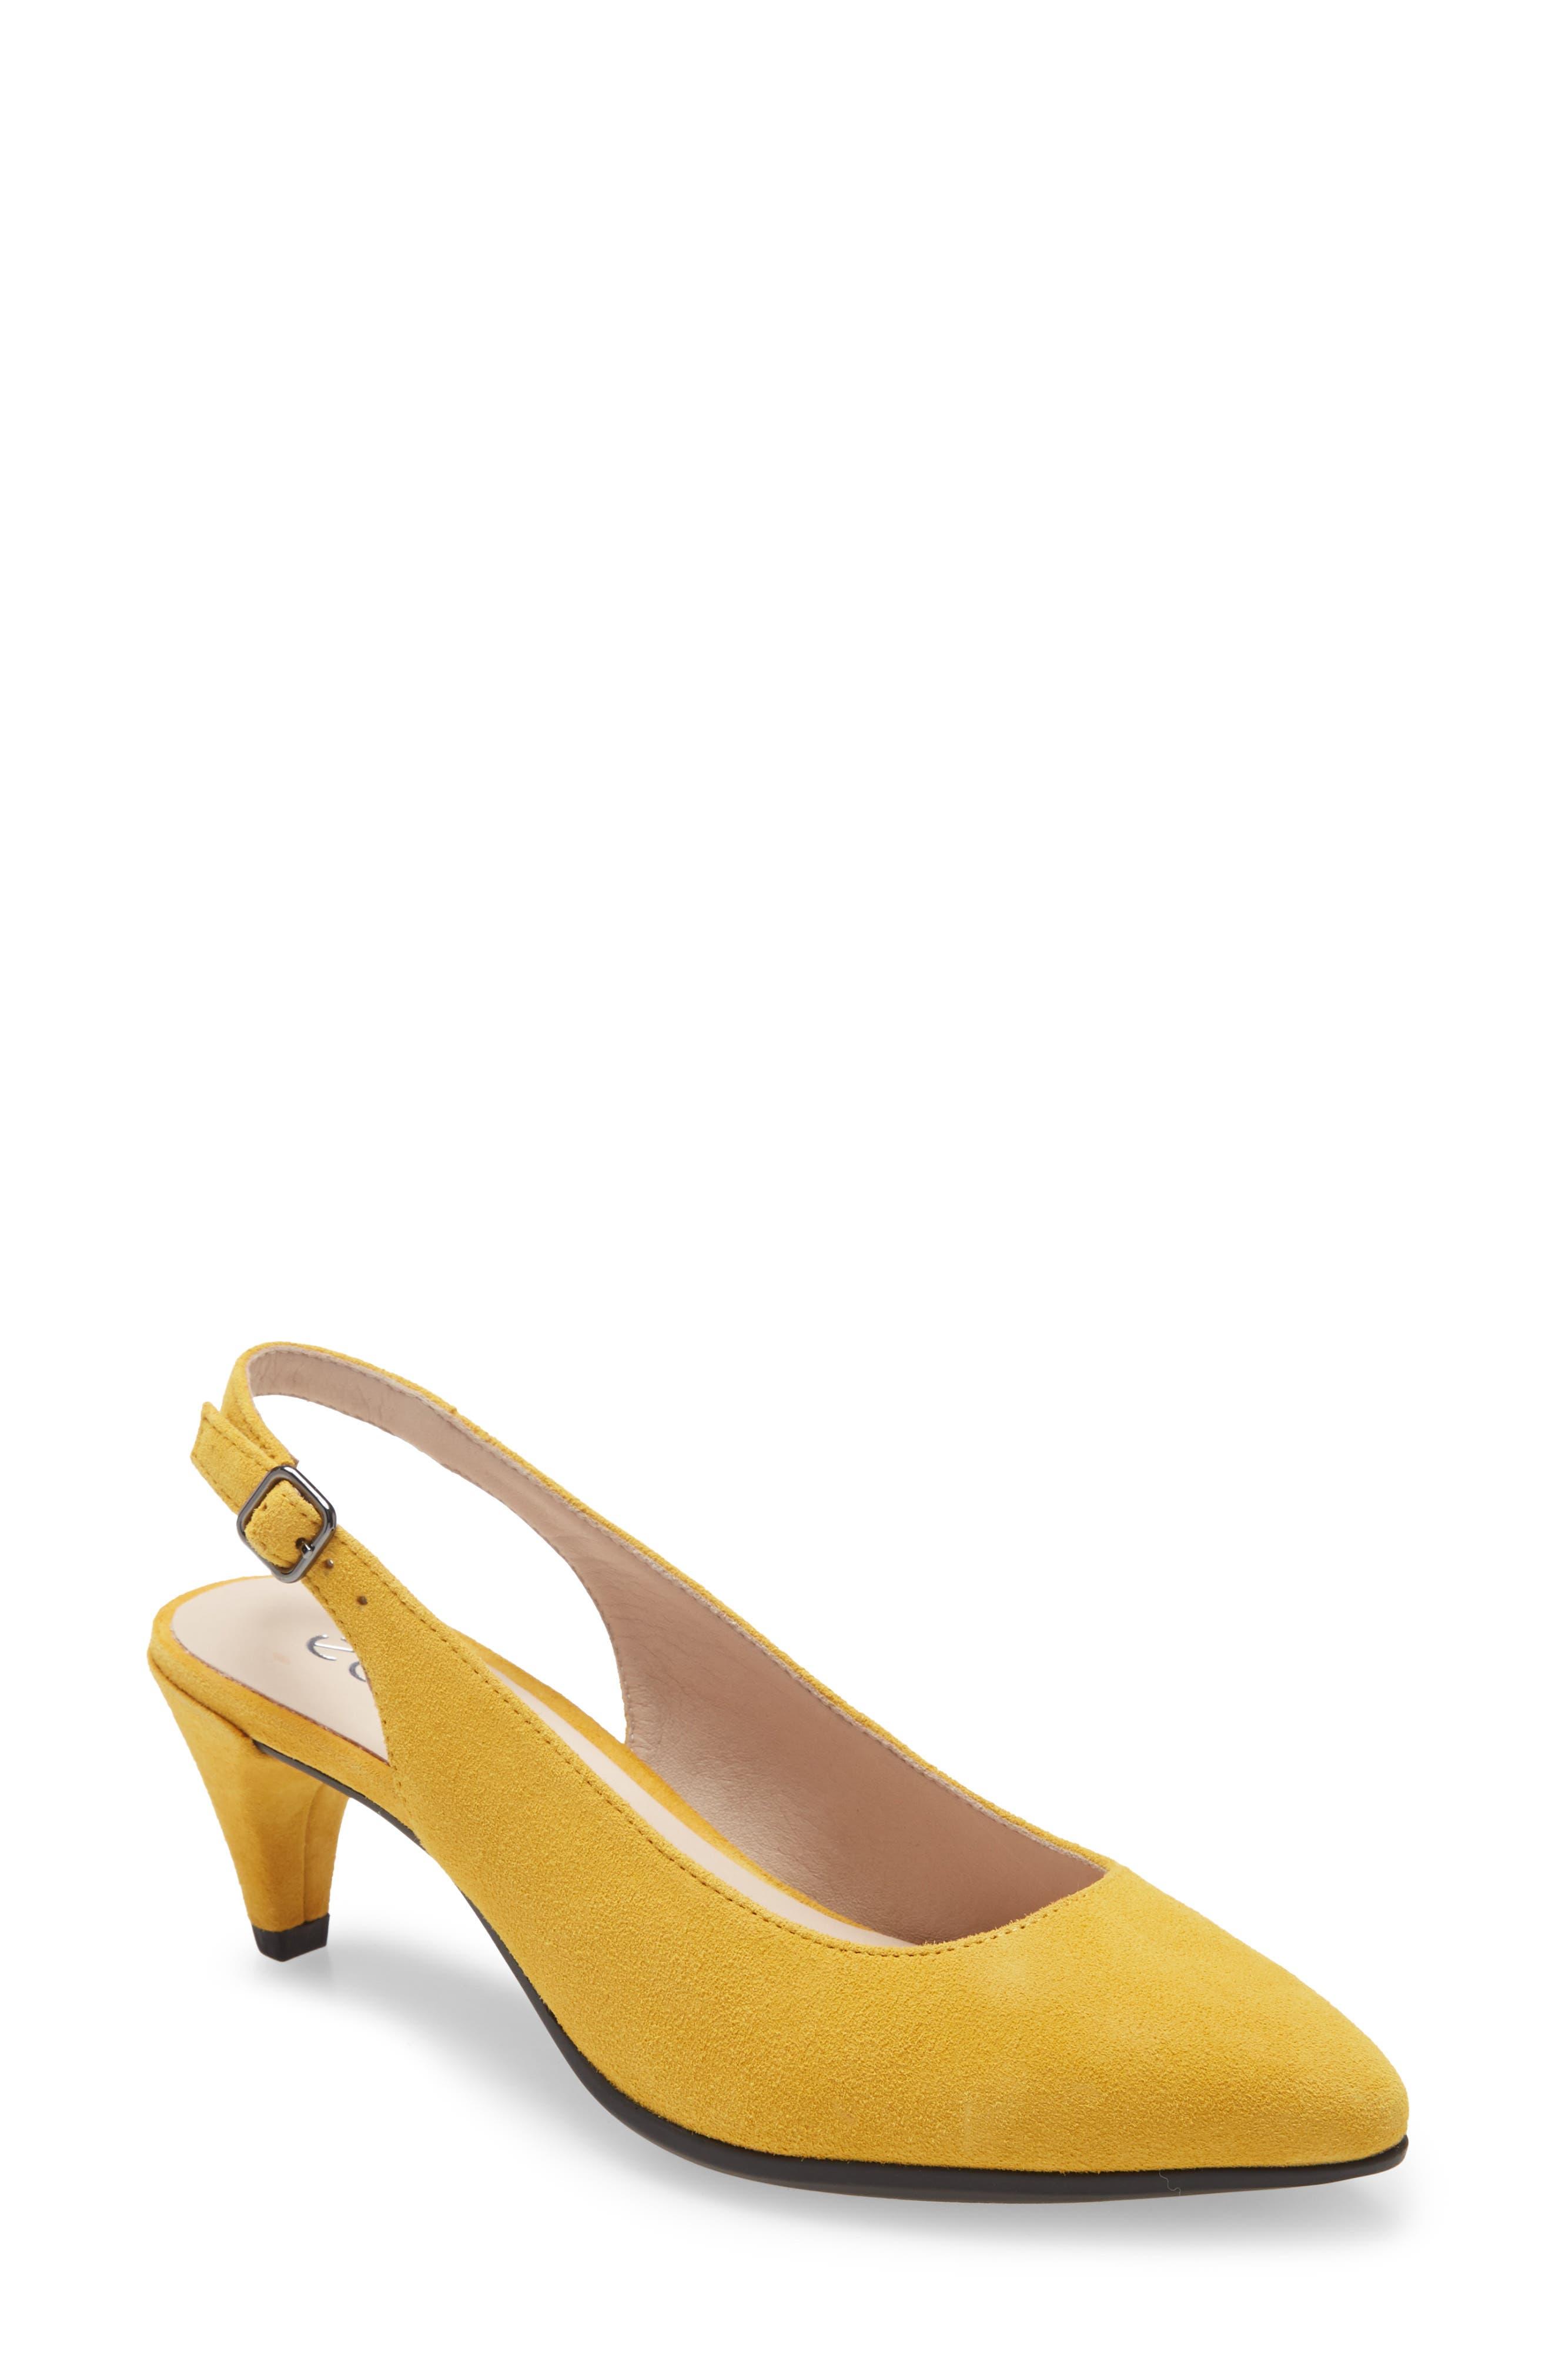 Women's Ecco Shape 45 Pointy Toe Slingback Pump